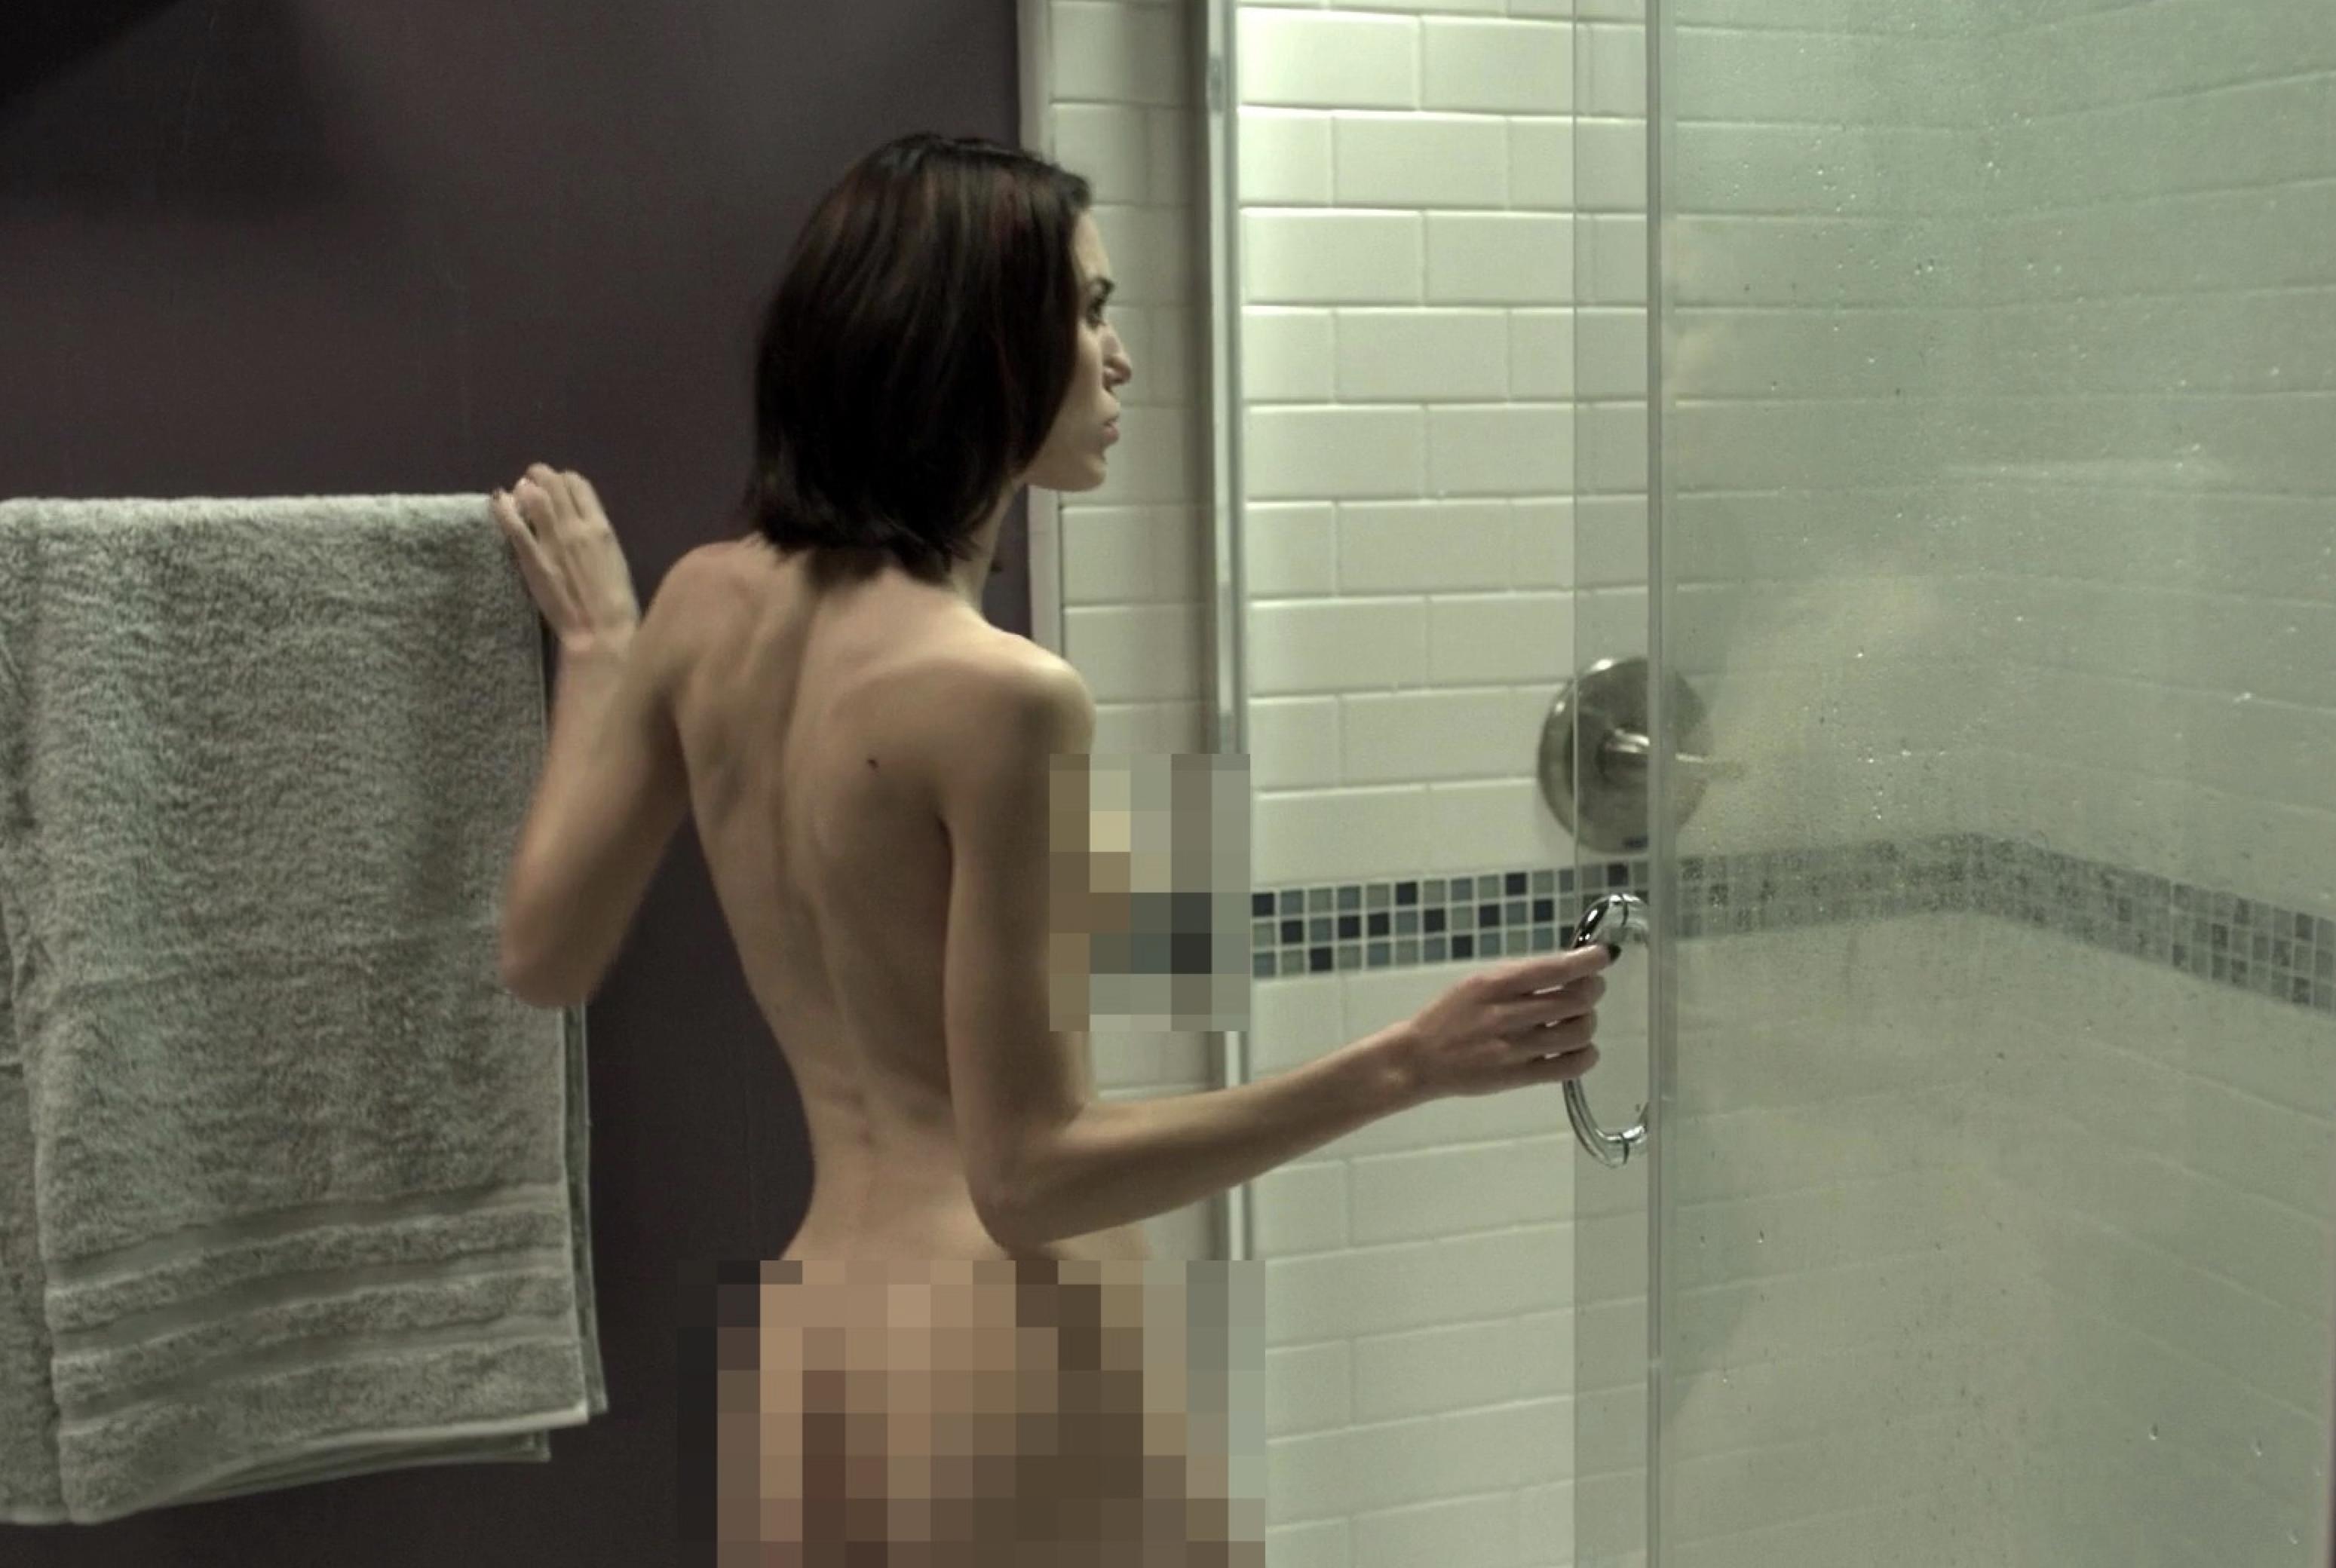 Nickelodeon Nude Stars Christy Carlson Romano